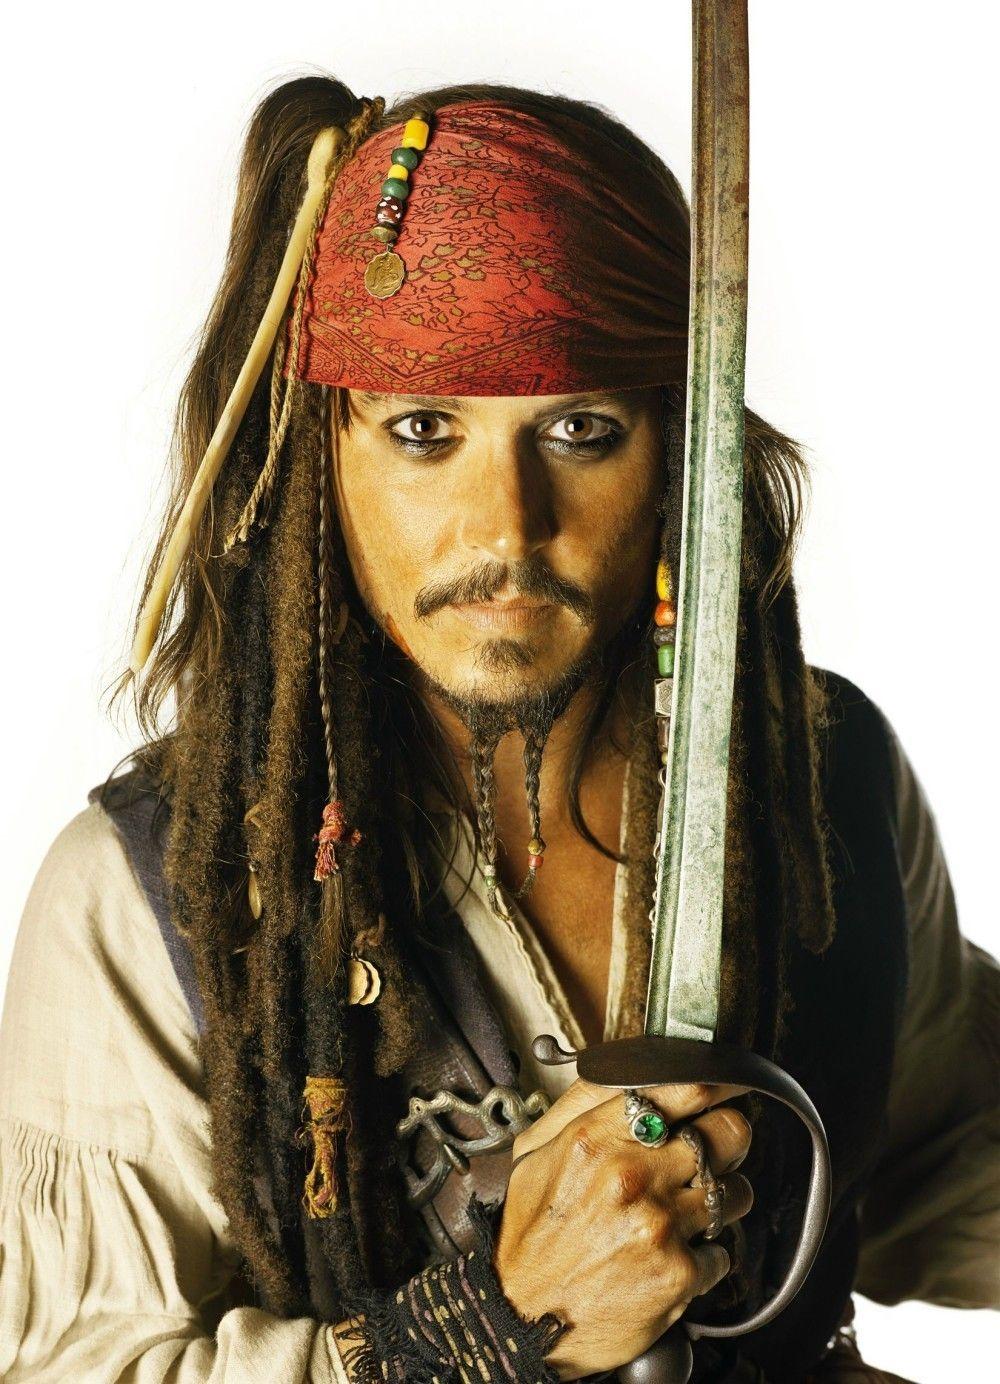 Jack Sparrow. Aye Matey And Mighty Sword Ready